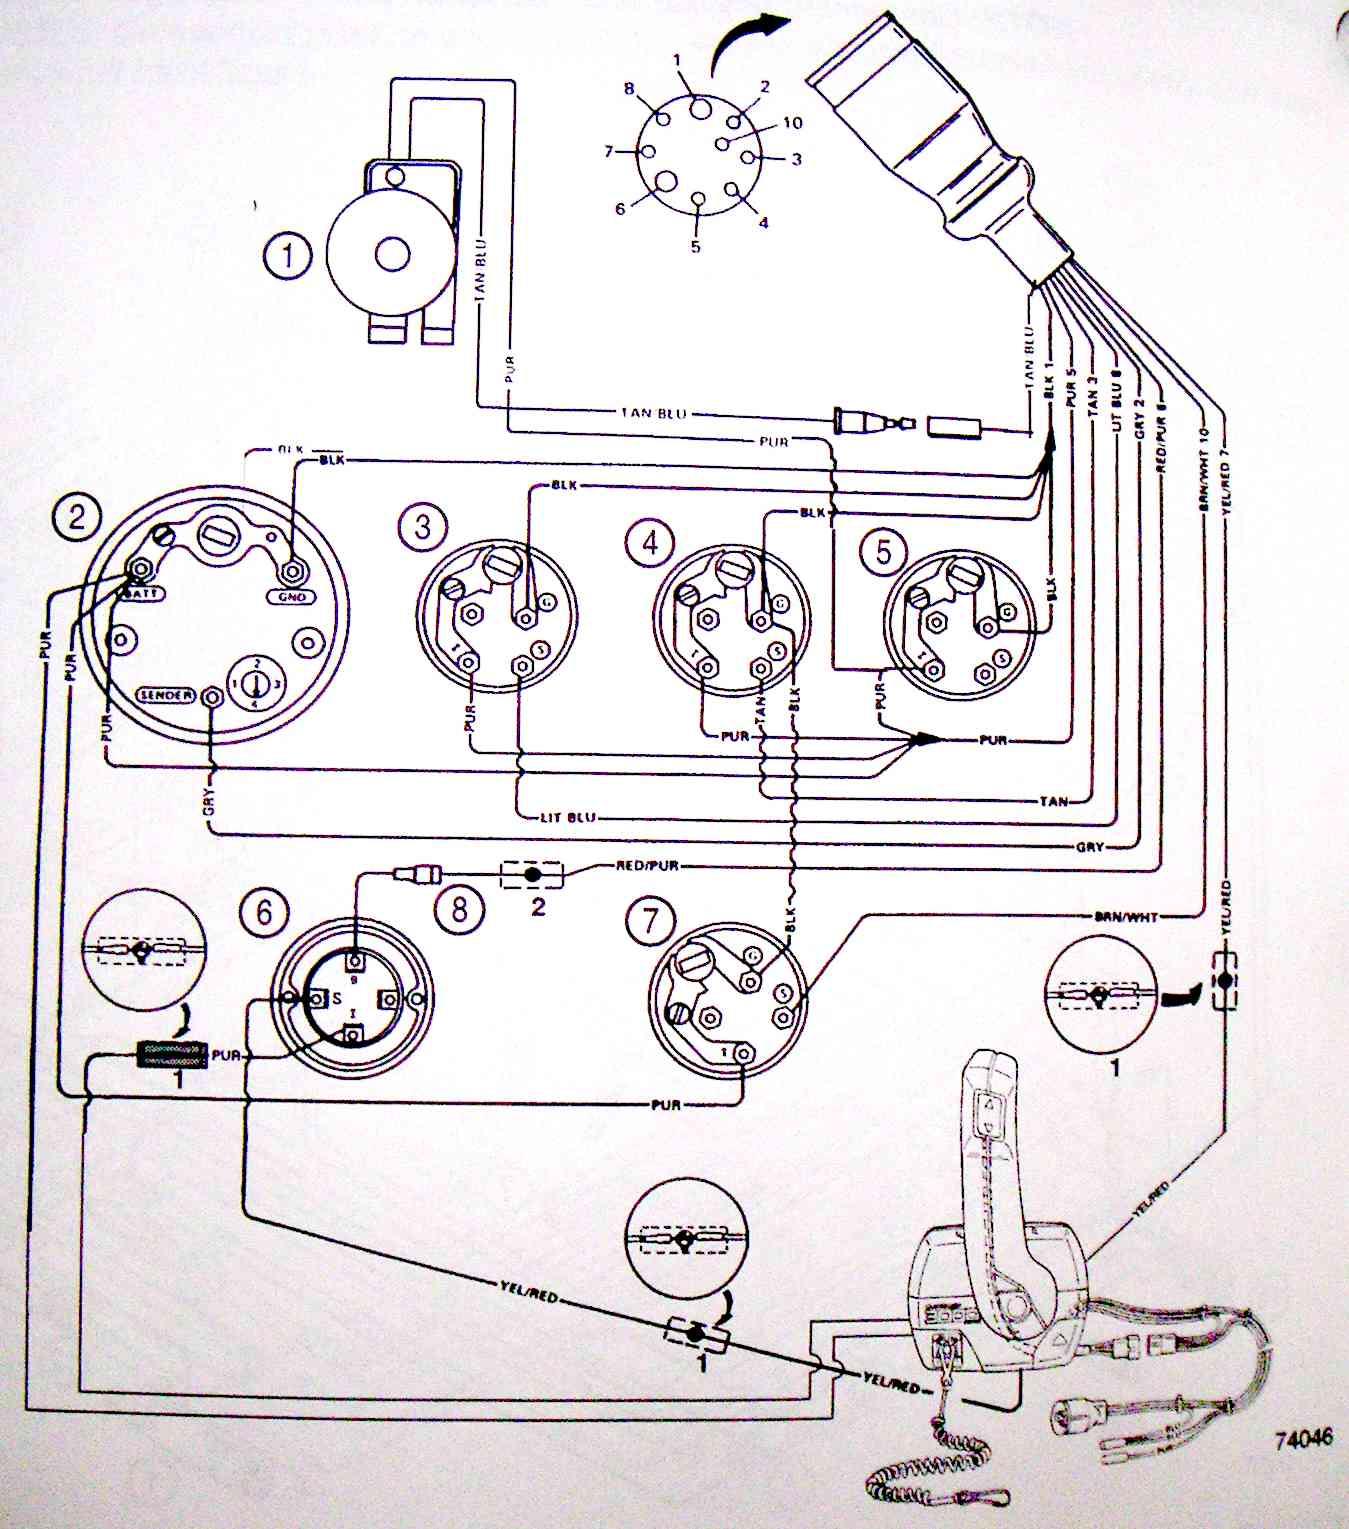 502 mpi wiring diagram of things diagrams elsavadorla